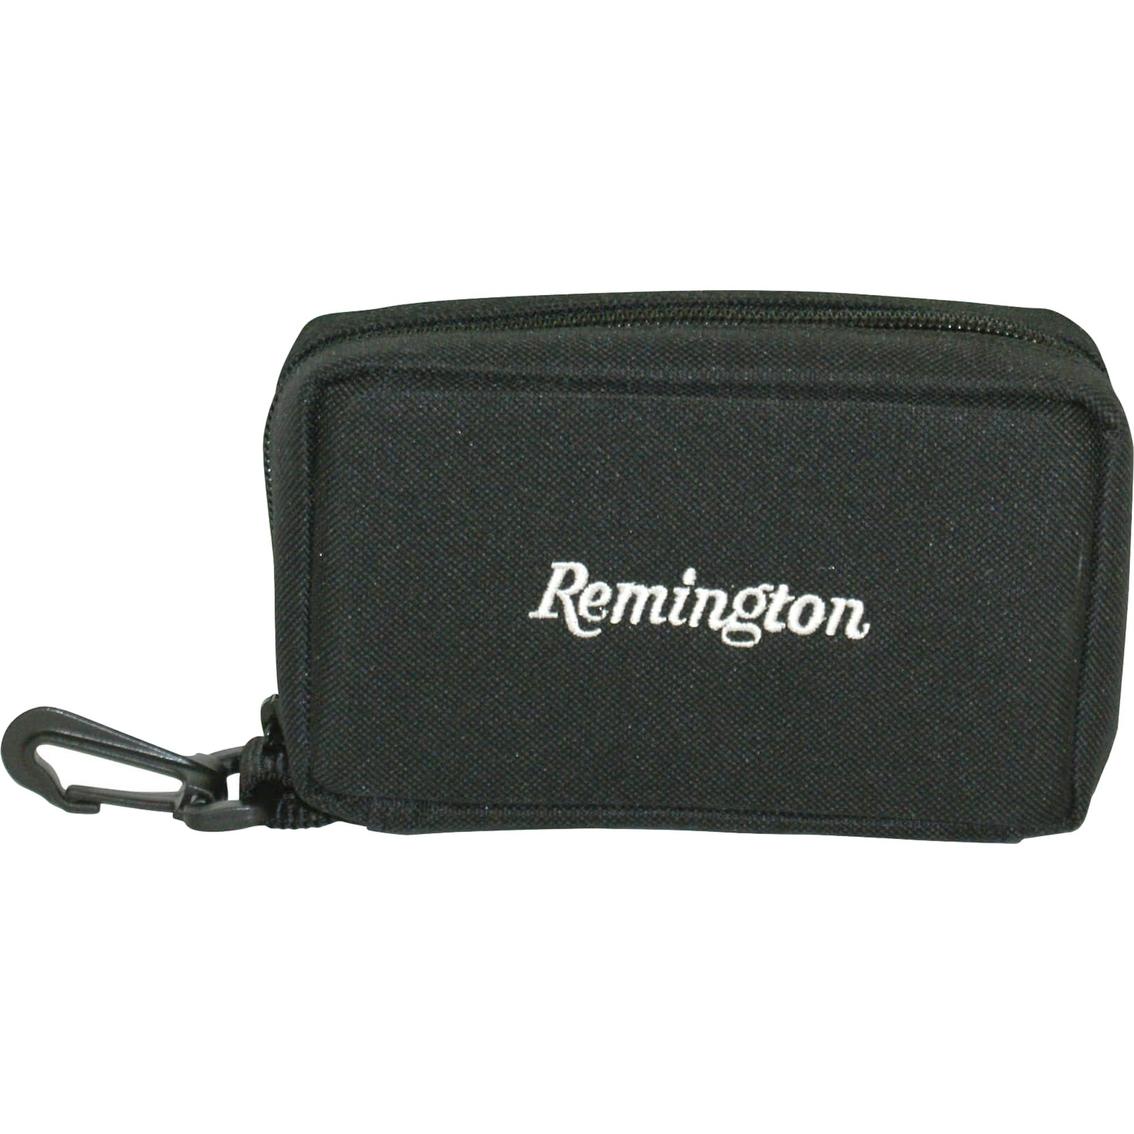 Remington Cordura Choke Tube Case | Holsters & Cases